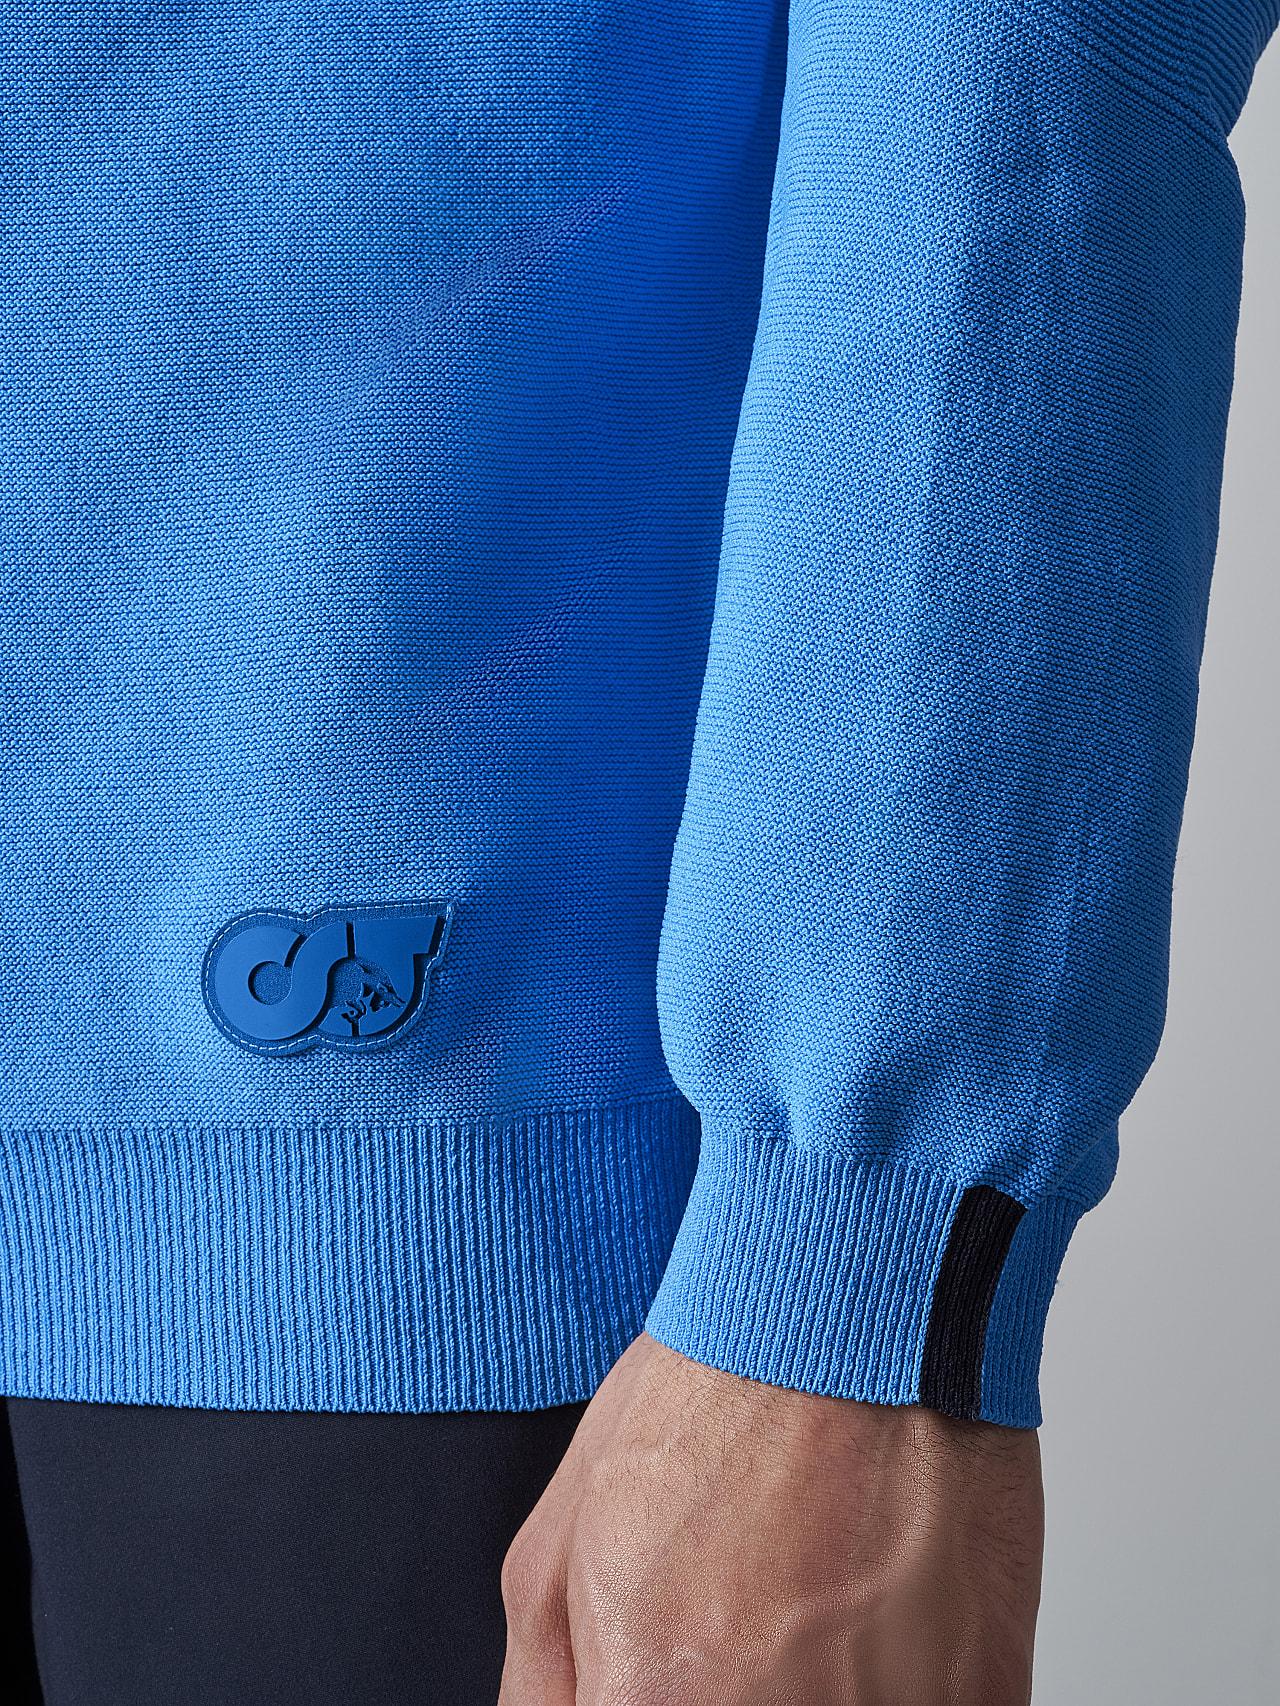 FUZZO V1.Y5.02 Seamless 3D Knit Roll-Neck Jumper blue Extra Alpha Tauri